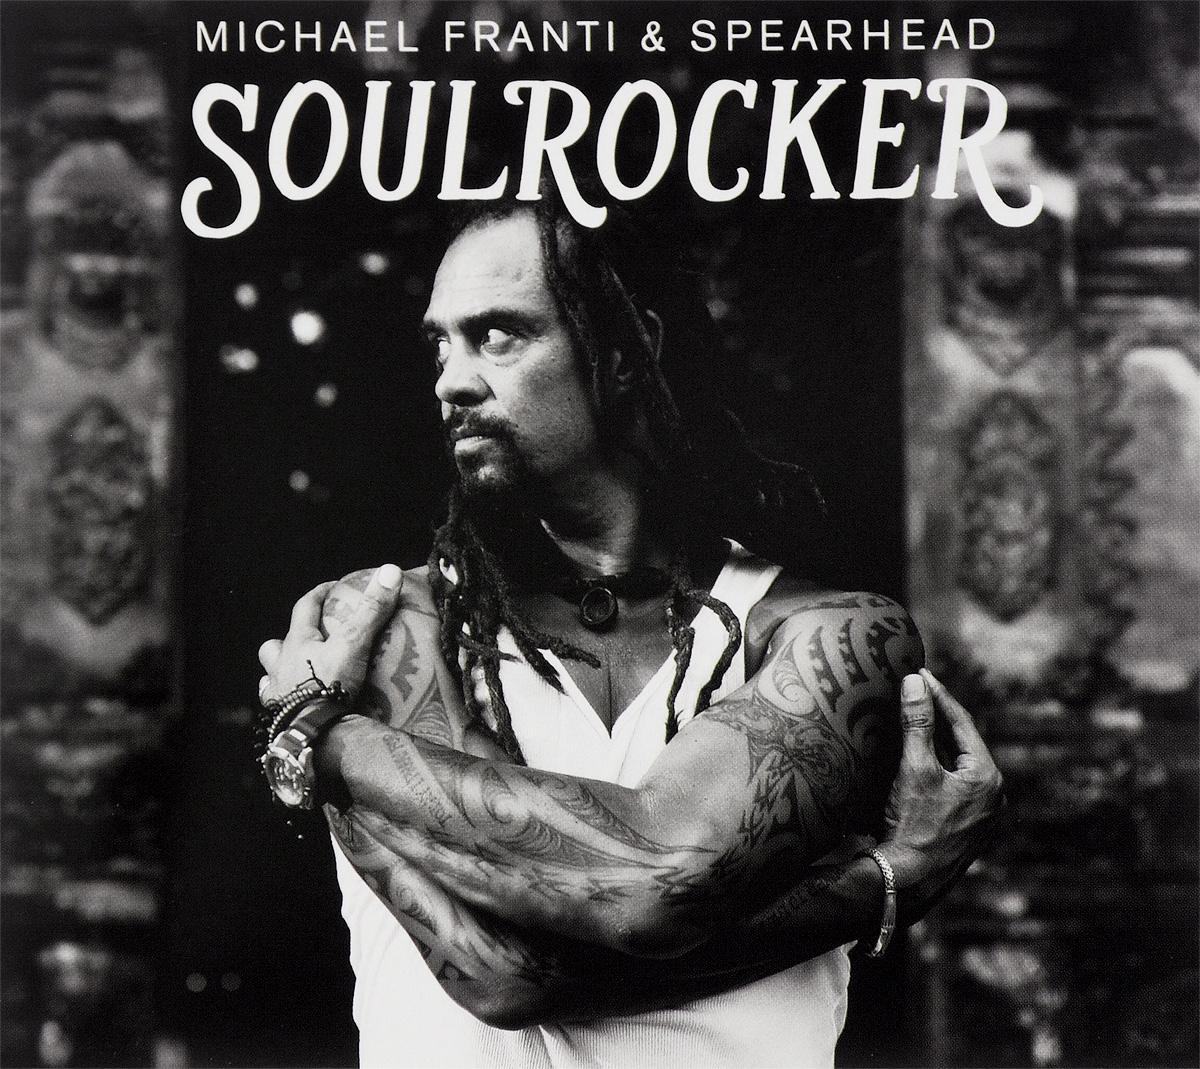 "Майкл Фрэнти,""Spearhead"" Michael Franti & Spearhead. Soulrocker"